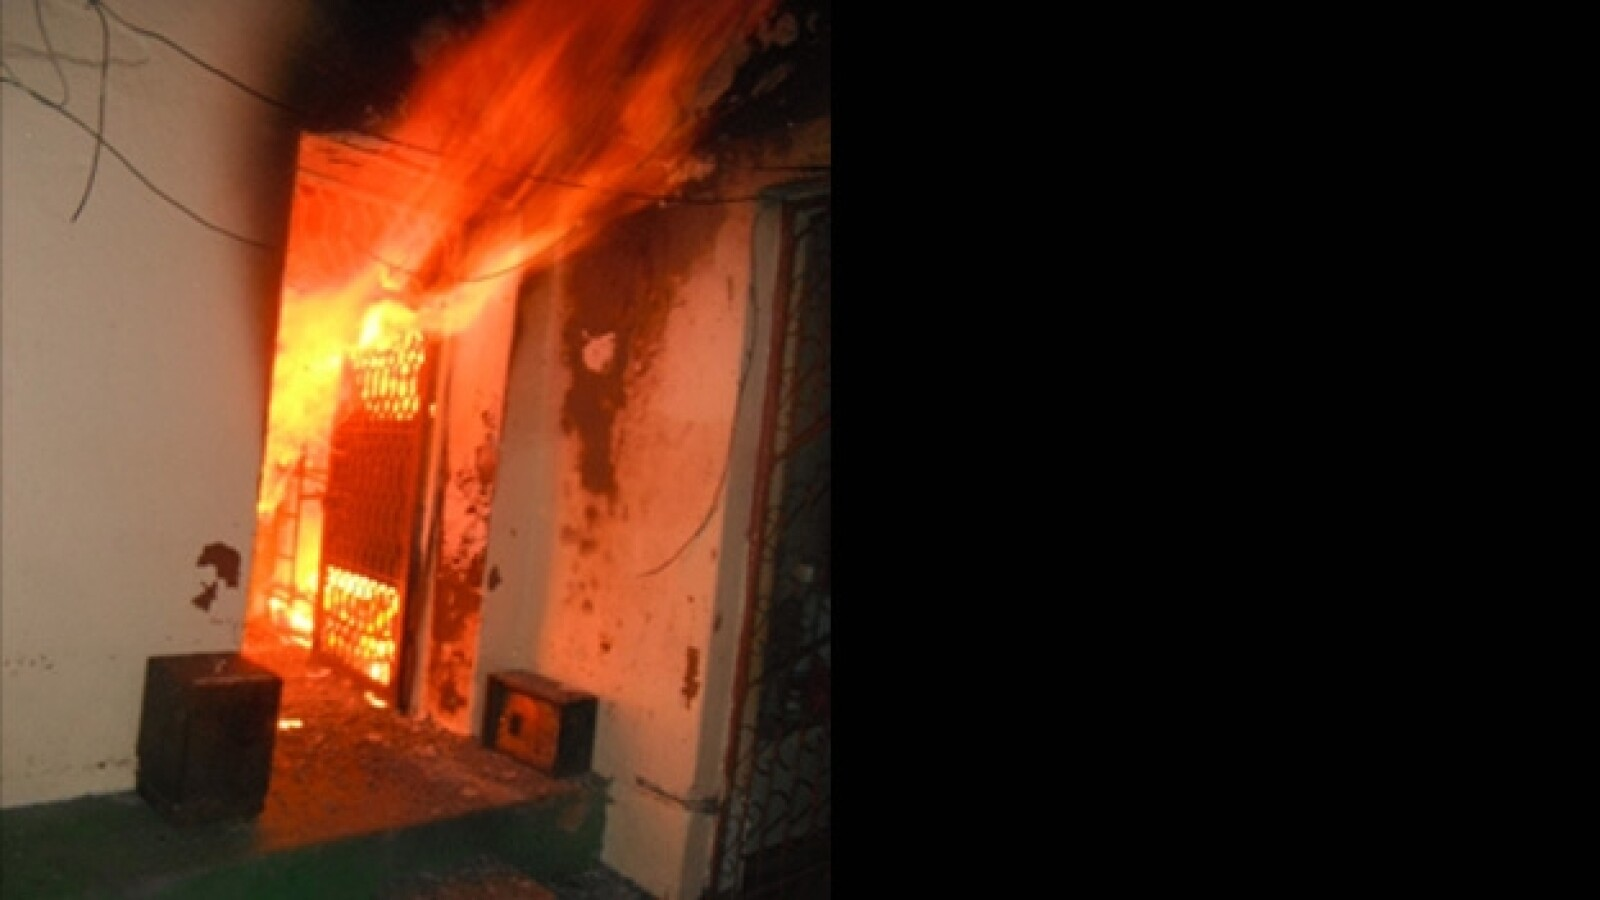 incendio en prision de motozintla chiapas